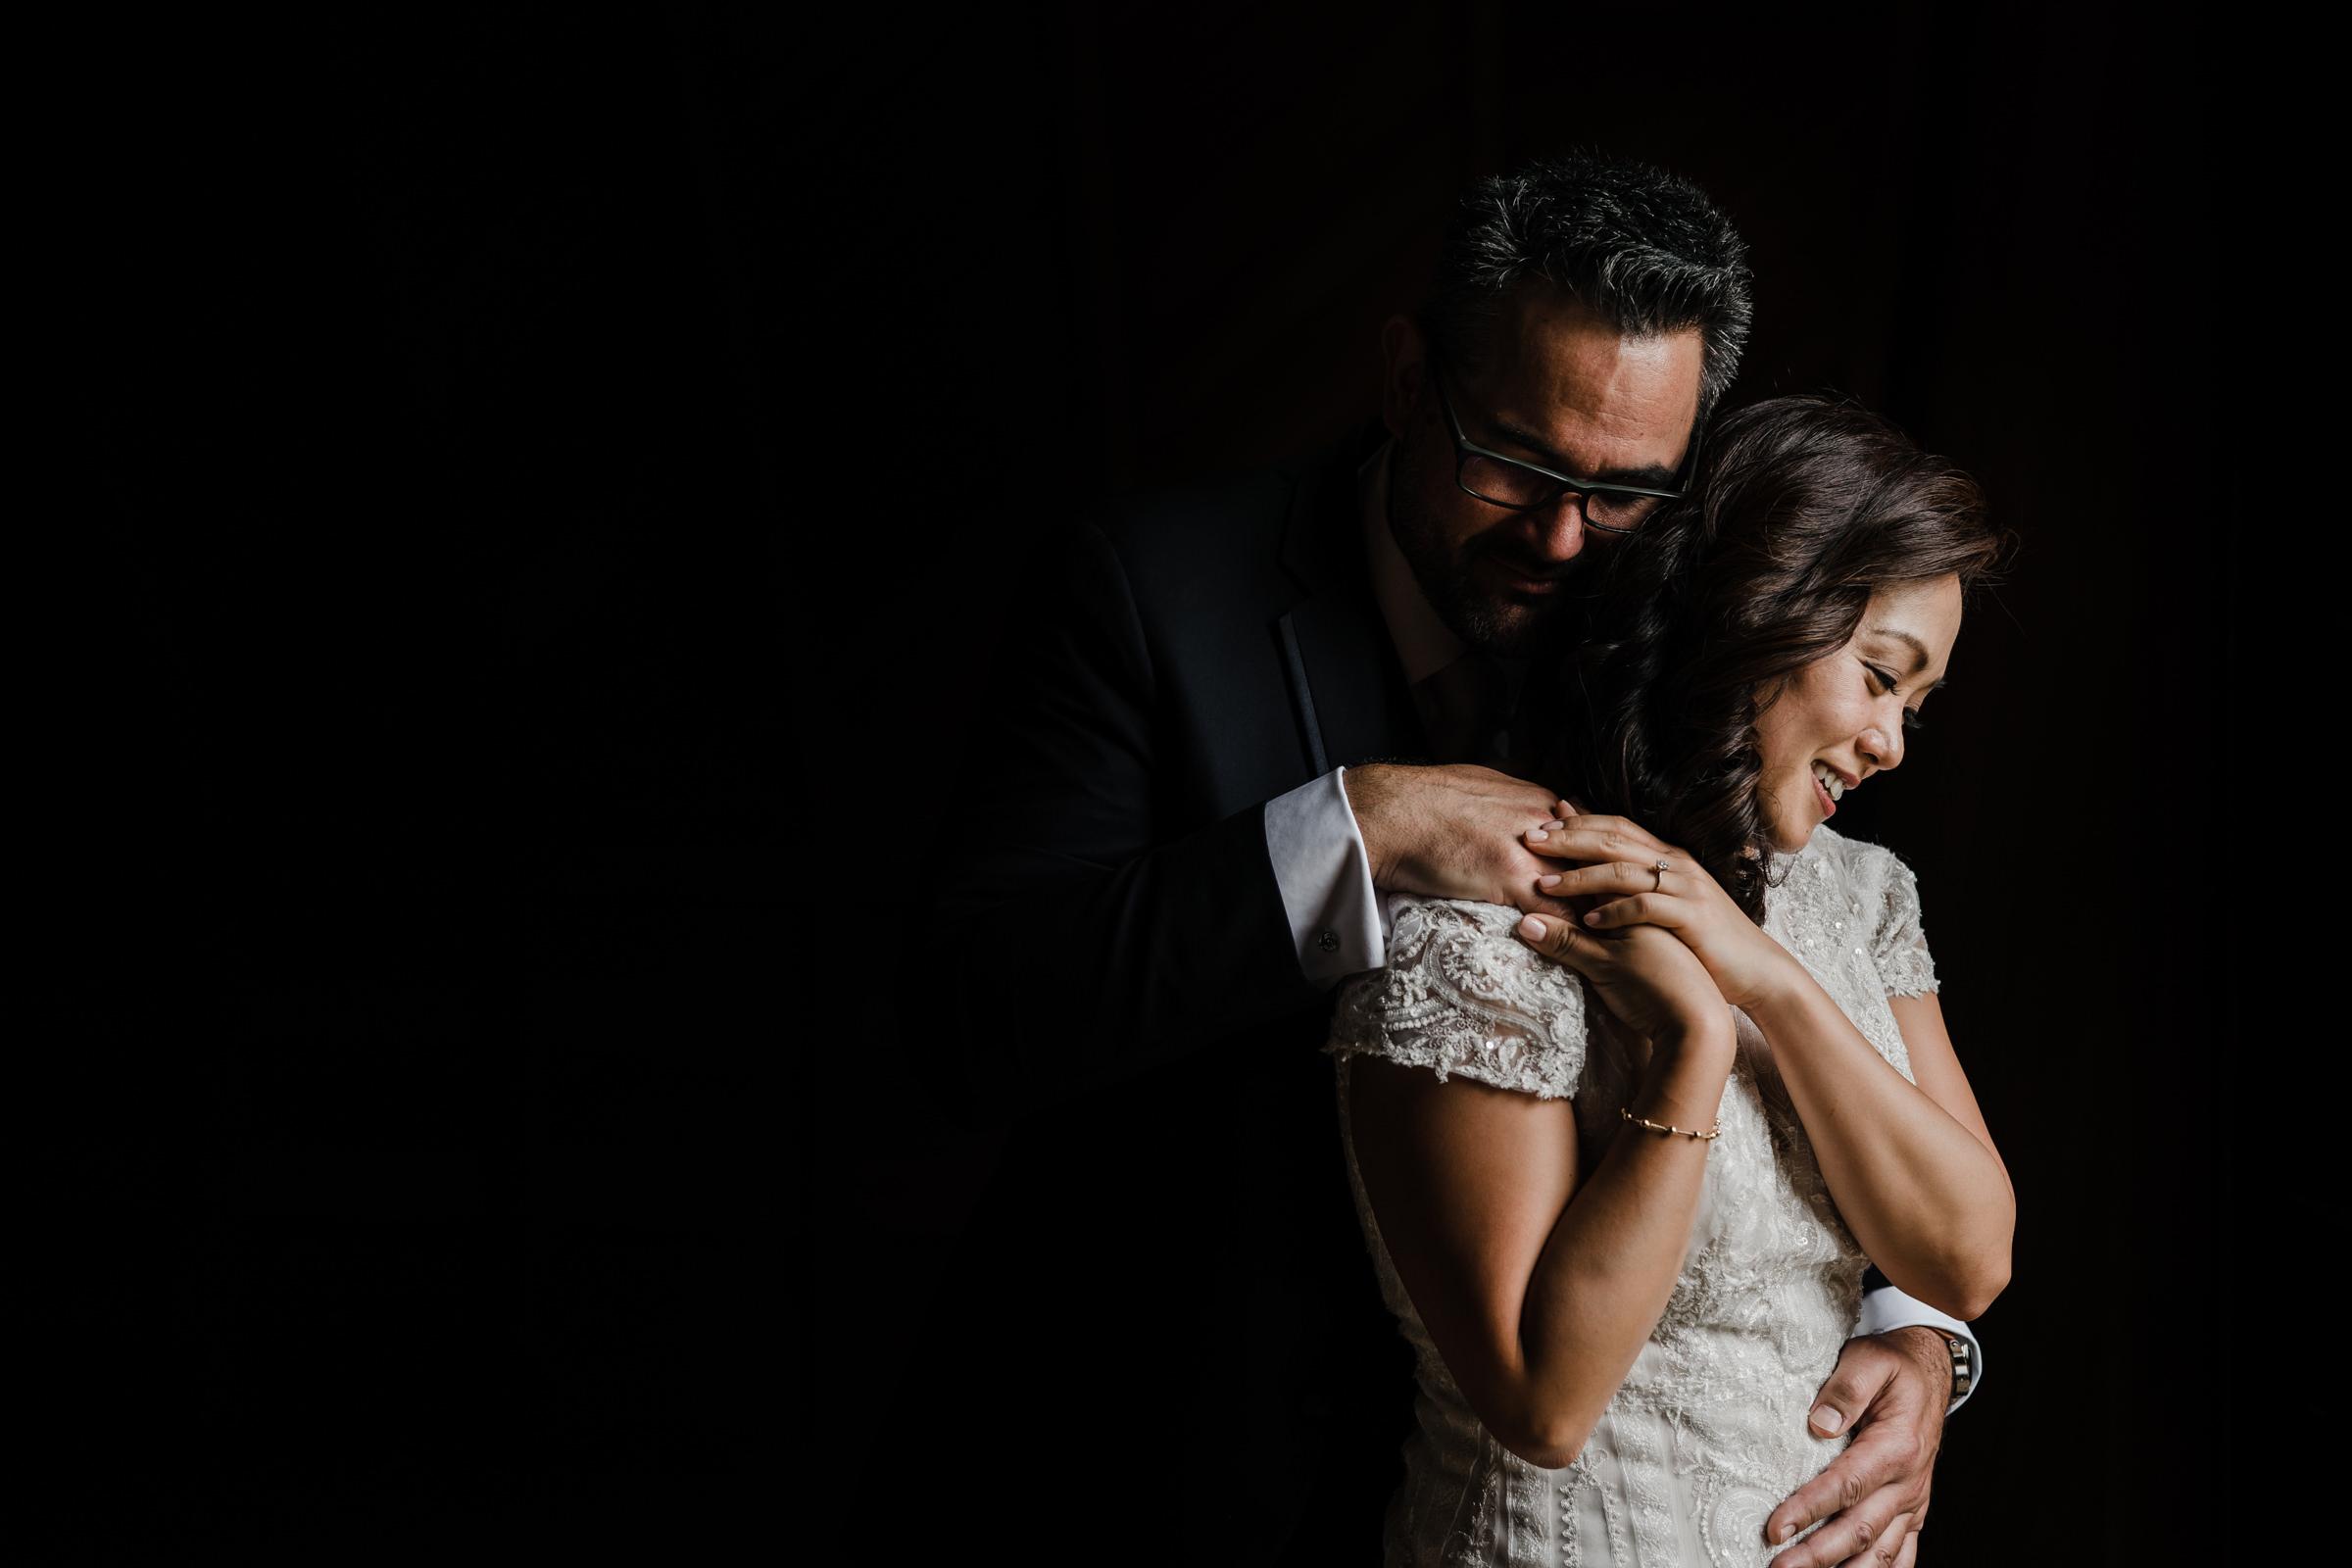 Bride and groom embrace - photo by Sasha Reiko Photography